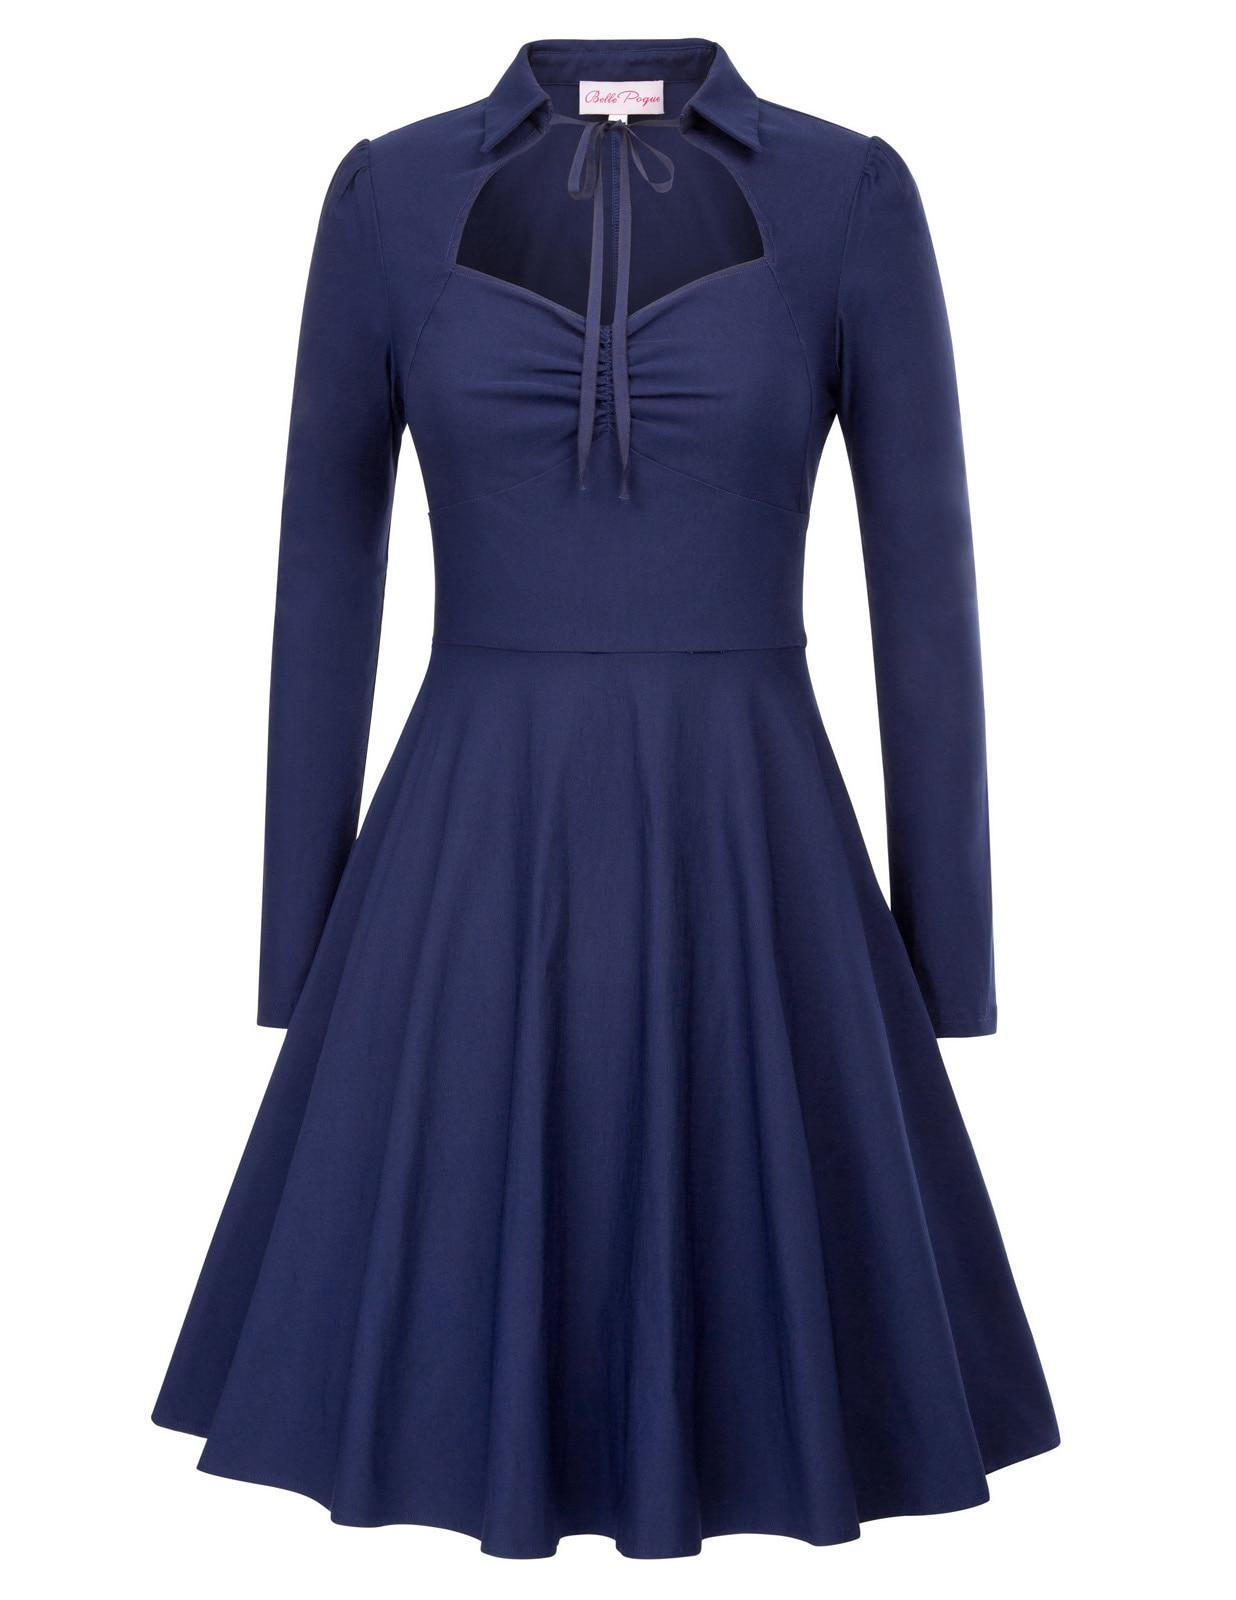 stock Spring Autumn vintage dress Women Solid Color Lapel Collar Flared A-Line hollow out medieval bandage Dress elegant vestido